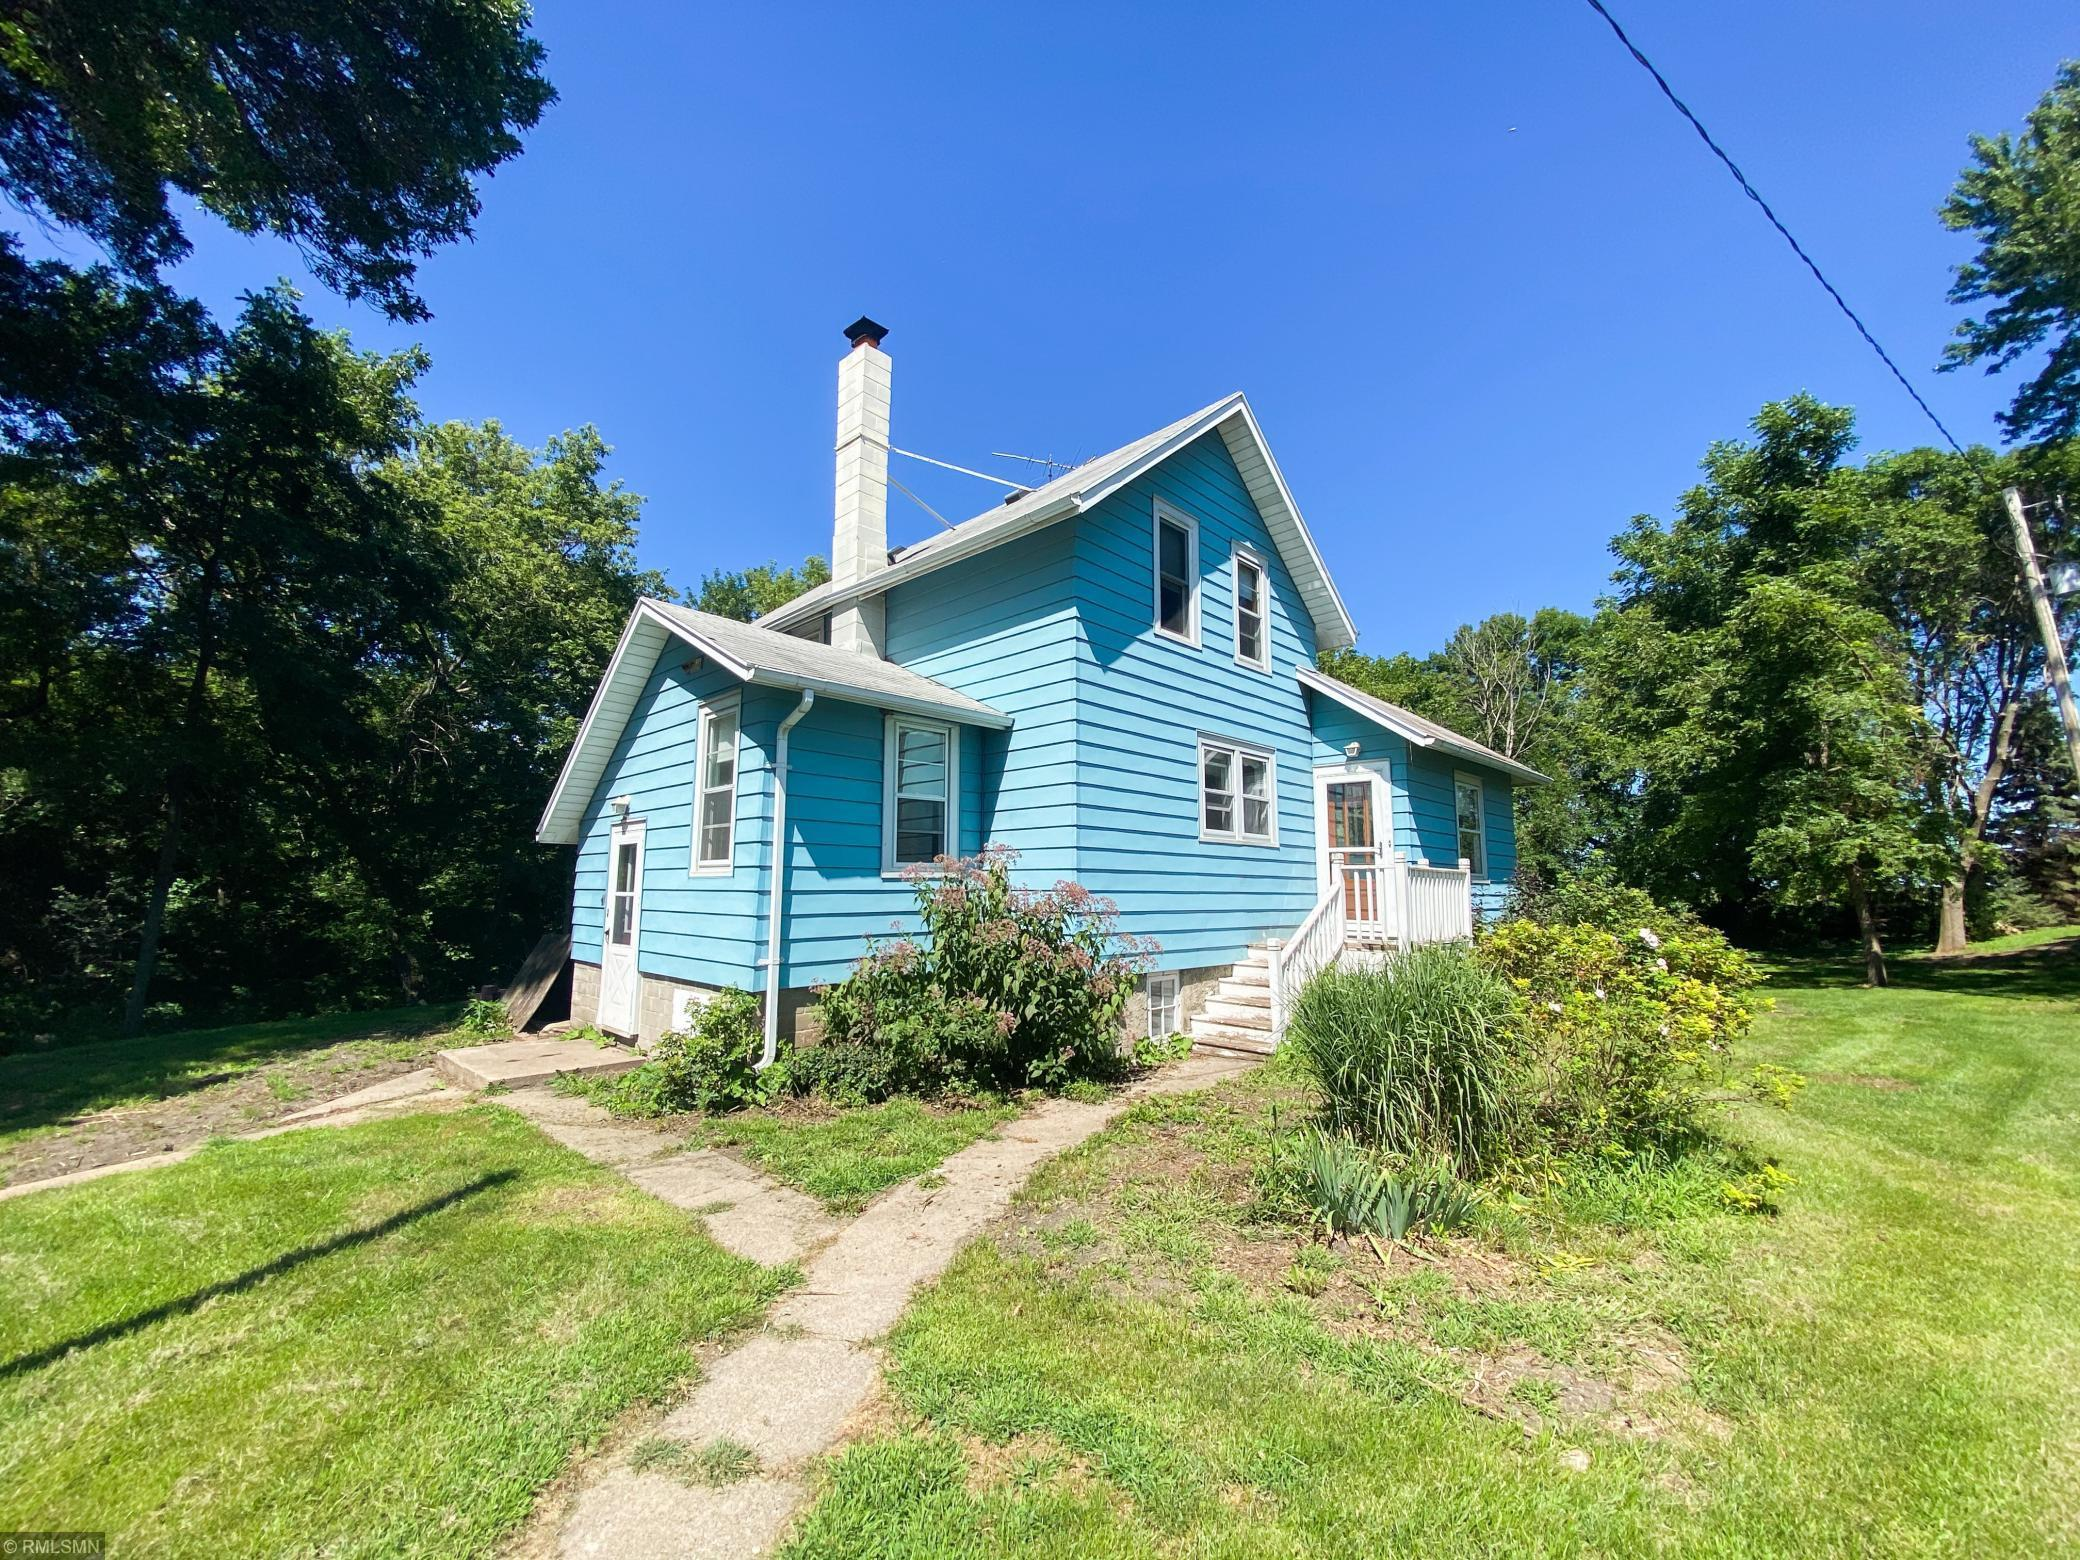 27454 425th Lane Property Photo - Arlington, MN real estate listing